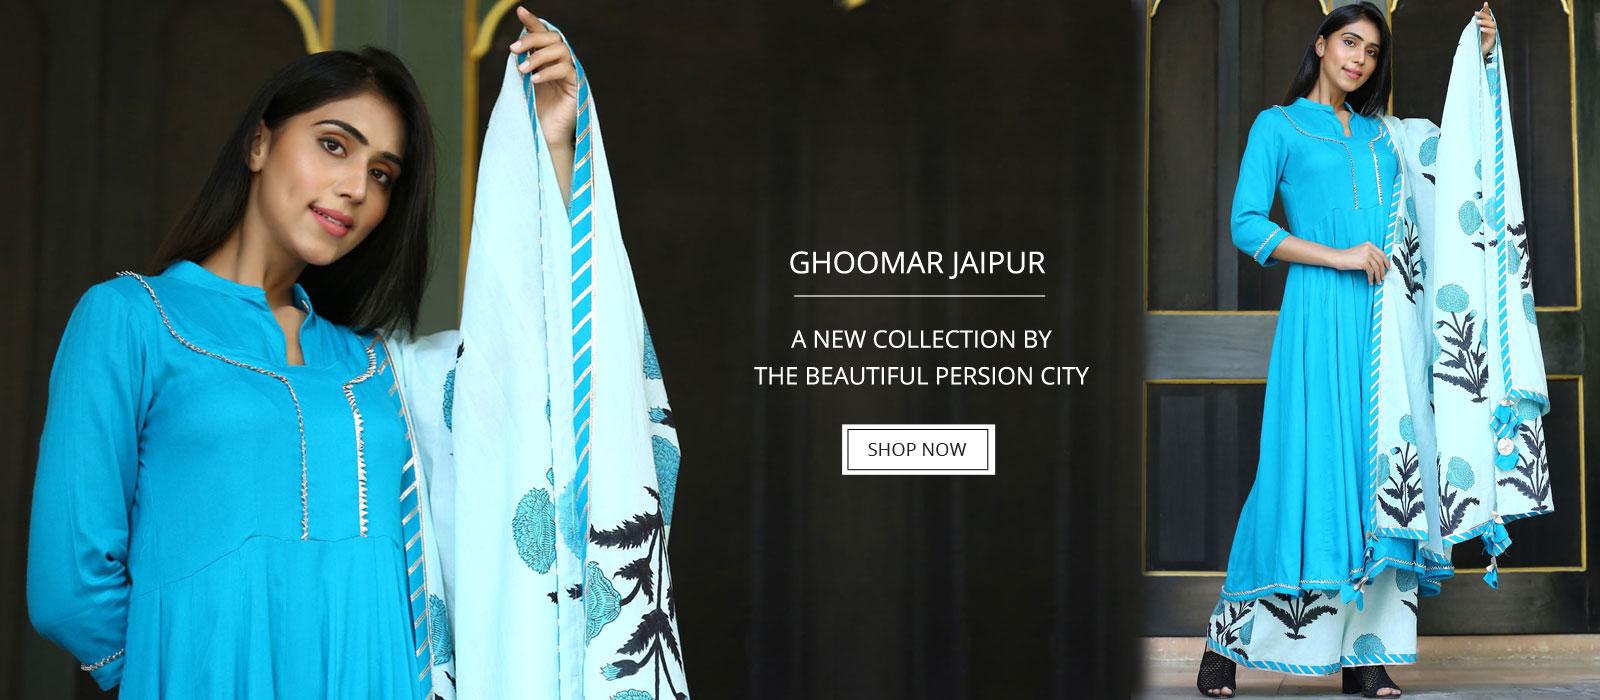 ghoomar-jaipur-slider-2